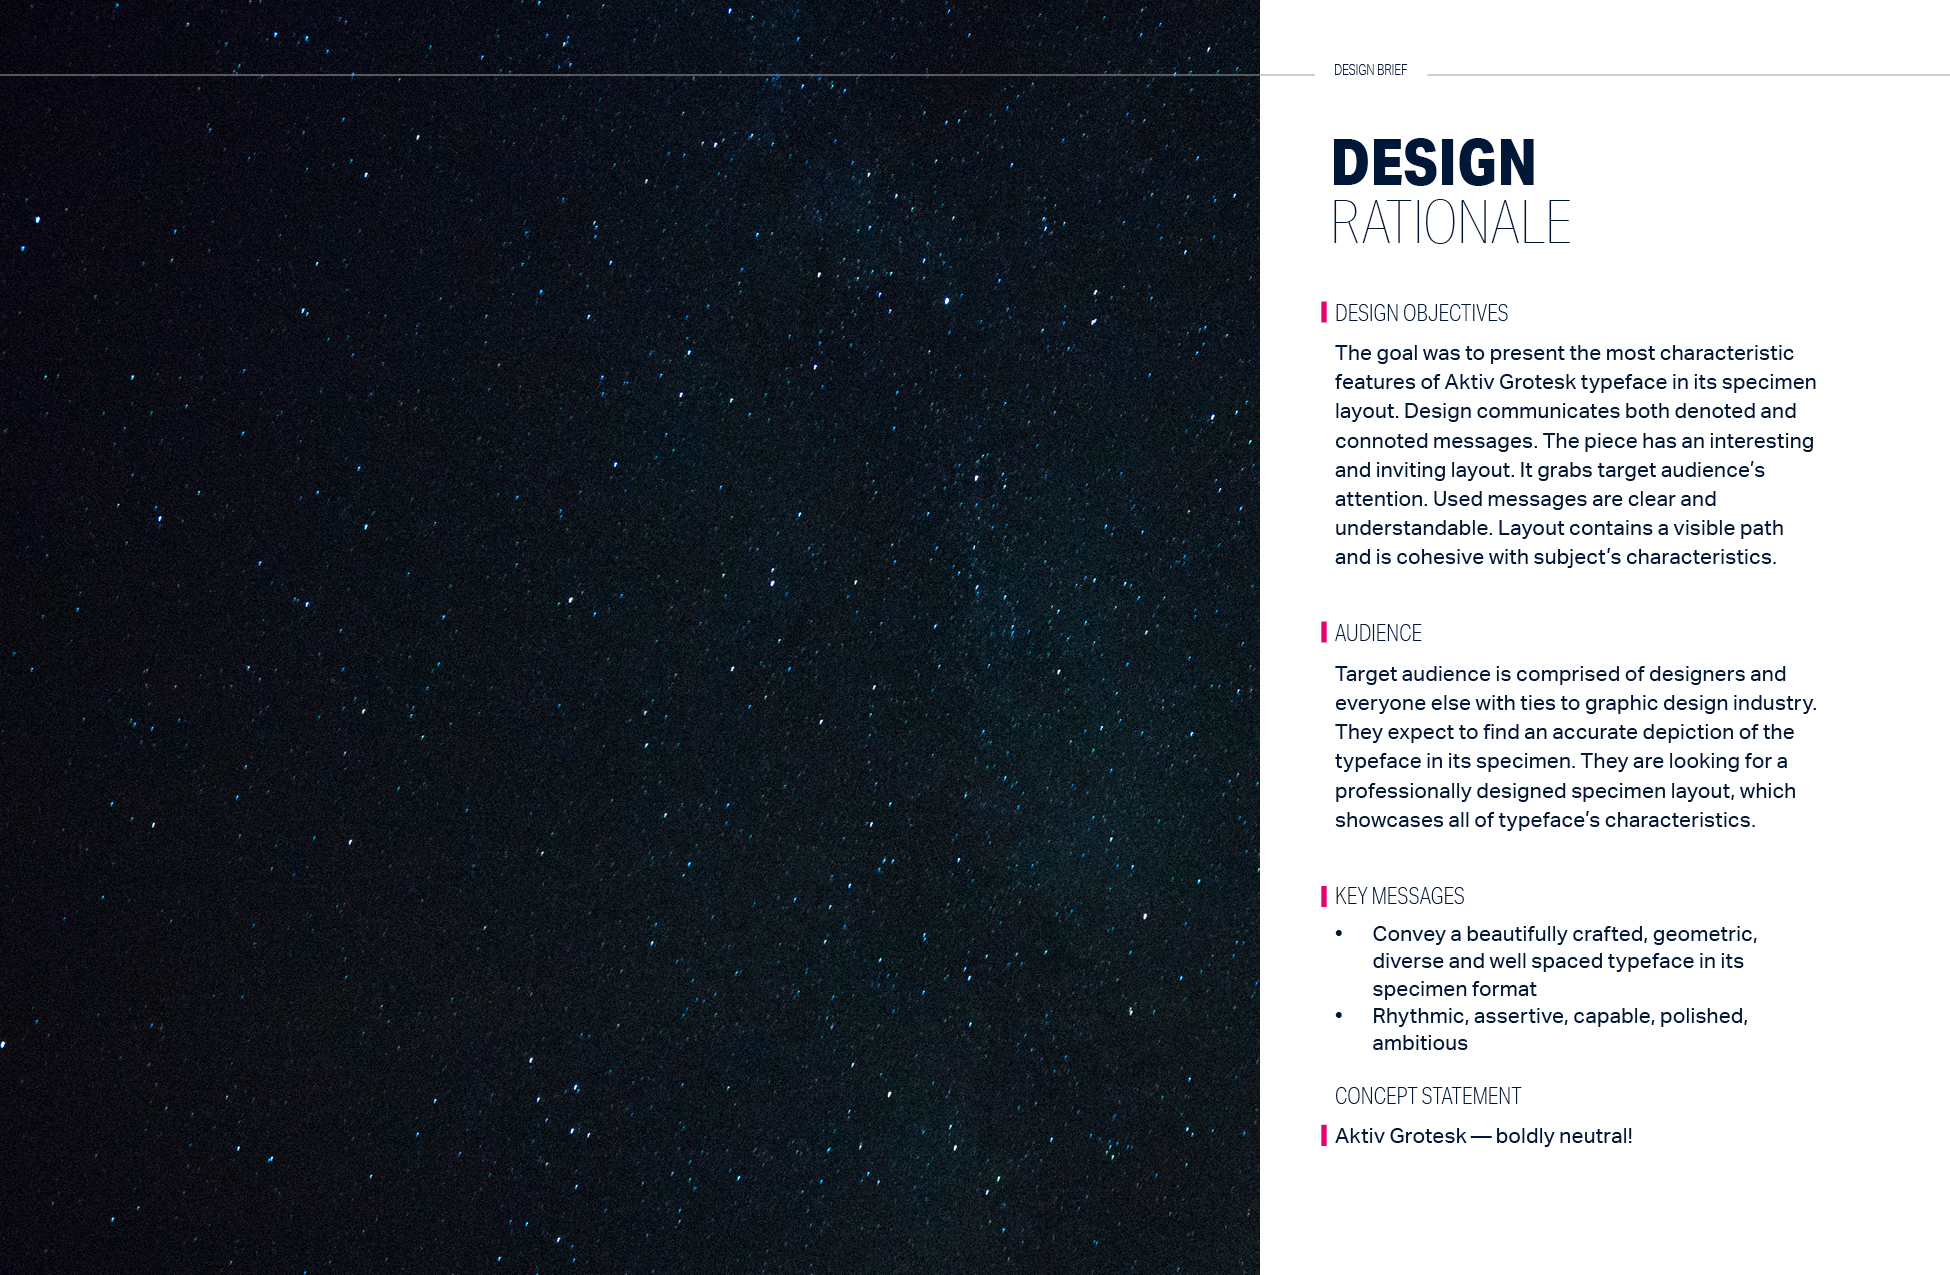 Gajos_design_rationale.jpg